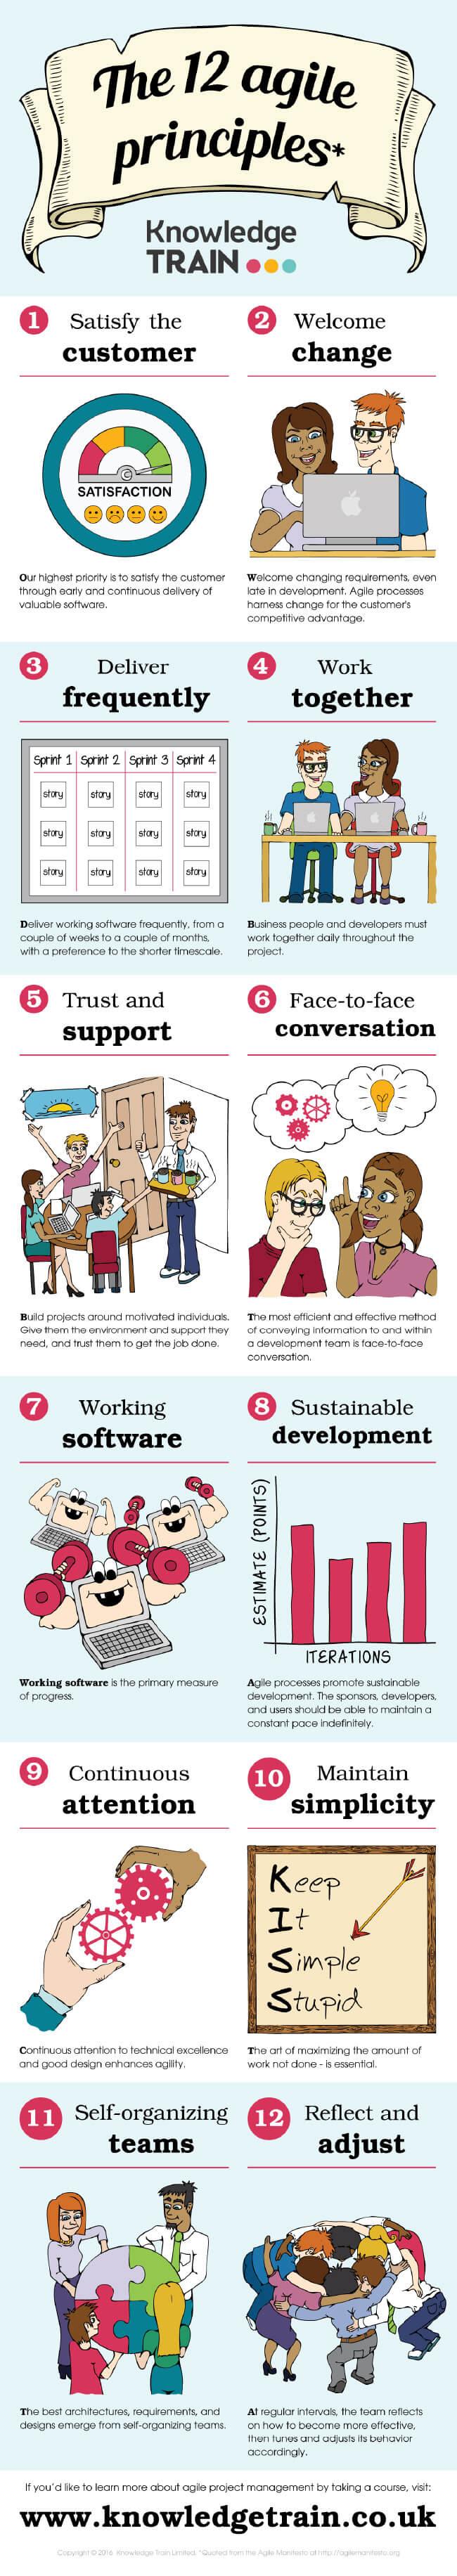 Image titled understanding agile values agile principles